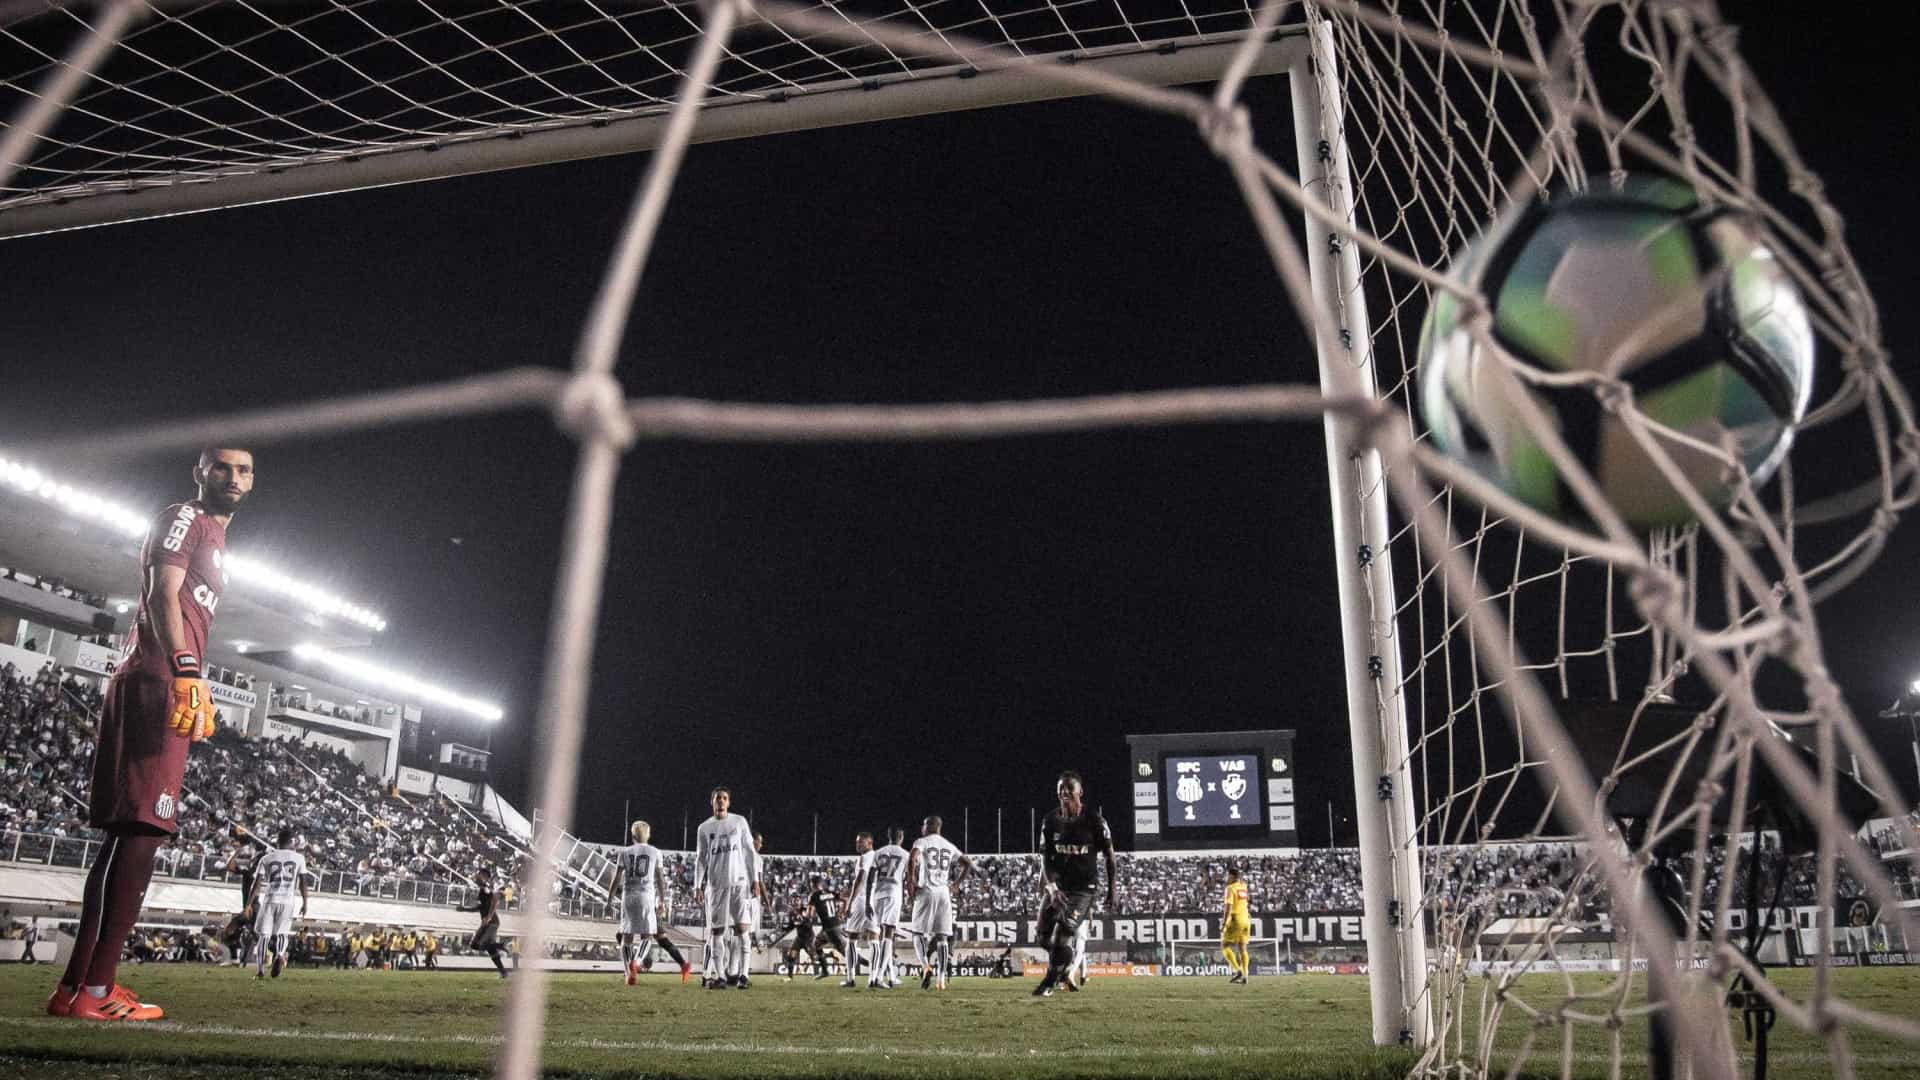 Estádio da Vila Belmiro é interditado por falta de laudo